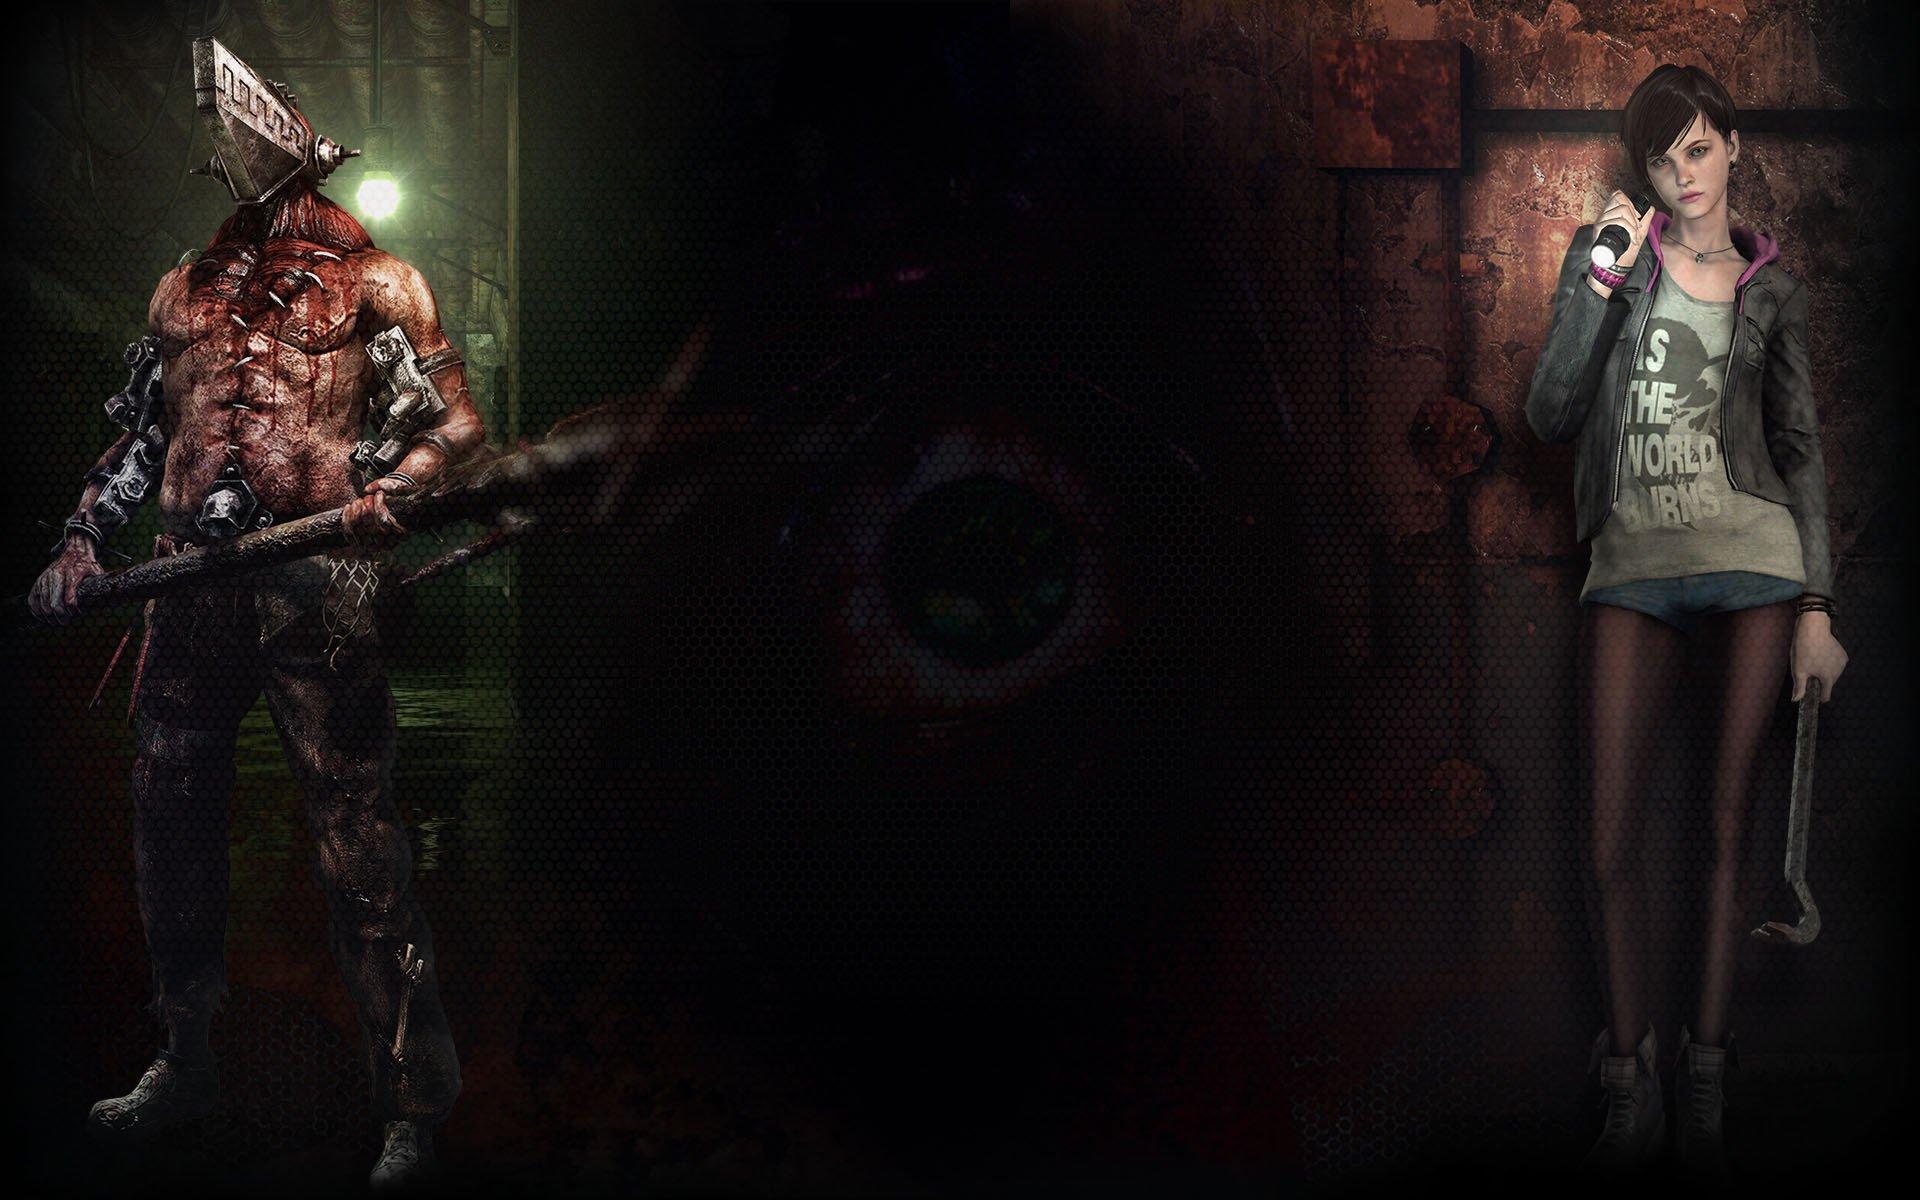 Pubg Wallpaper Alphacoder: Resident Evil: Revelations 2 Fondo De Pantalla HD